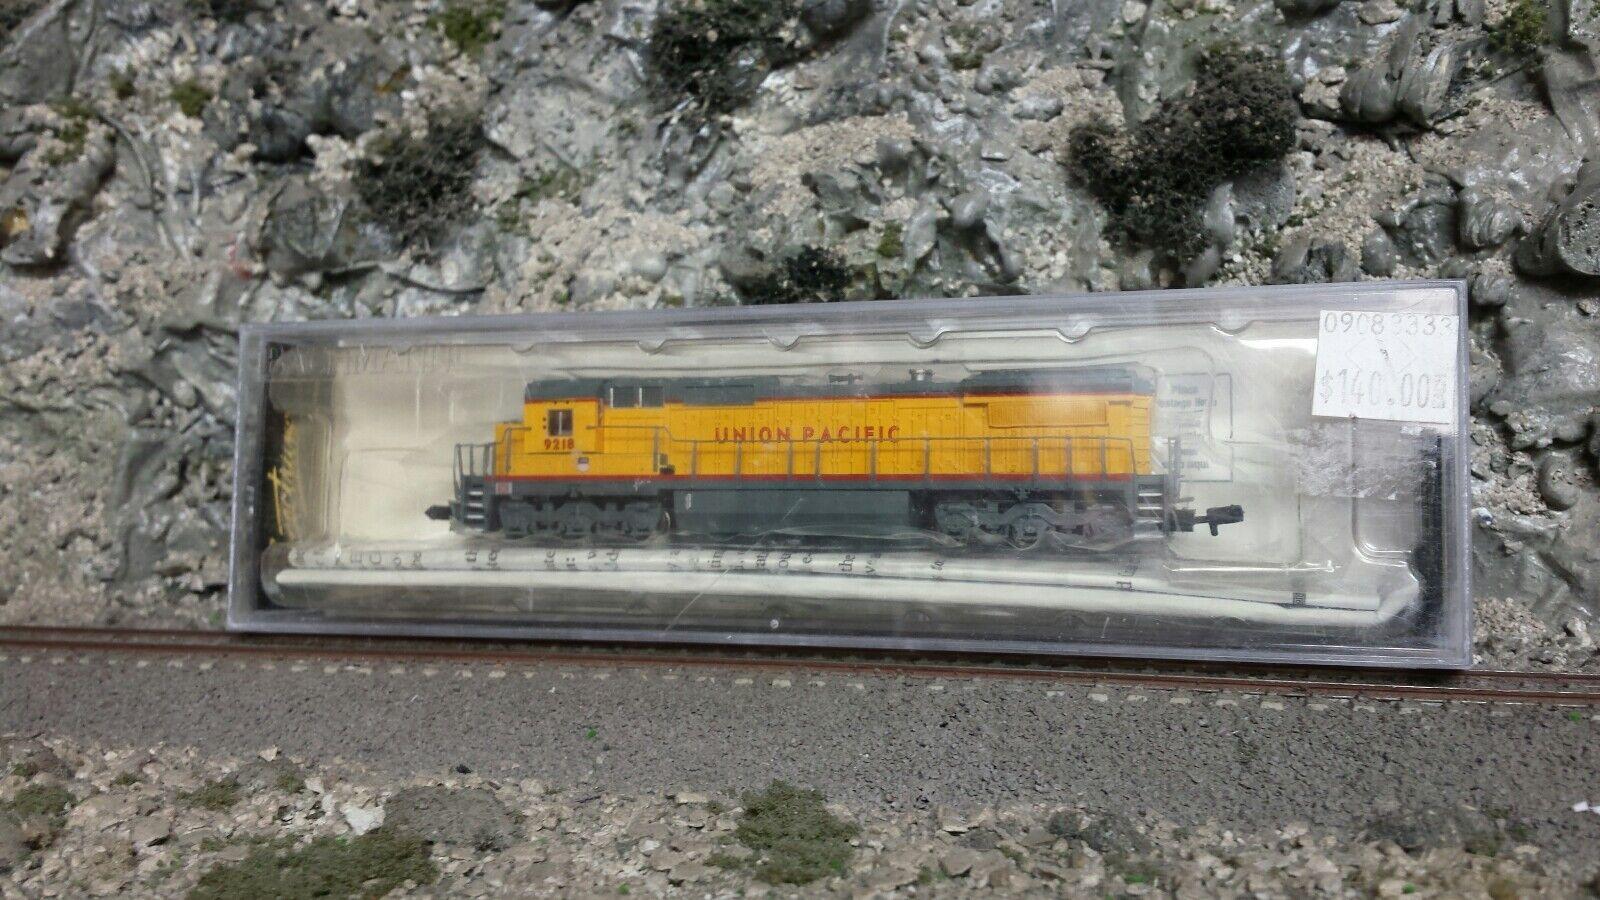 N scale UP Union Pacific 8-40C diesel locomotive